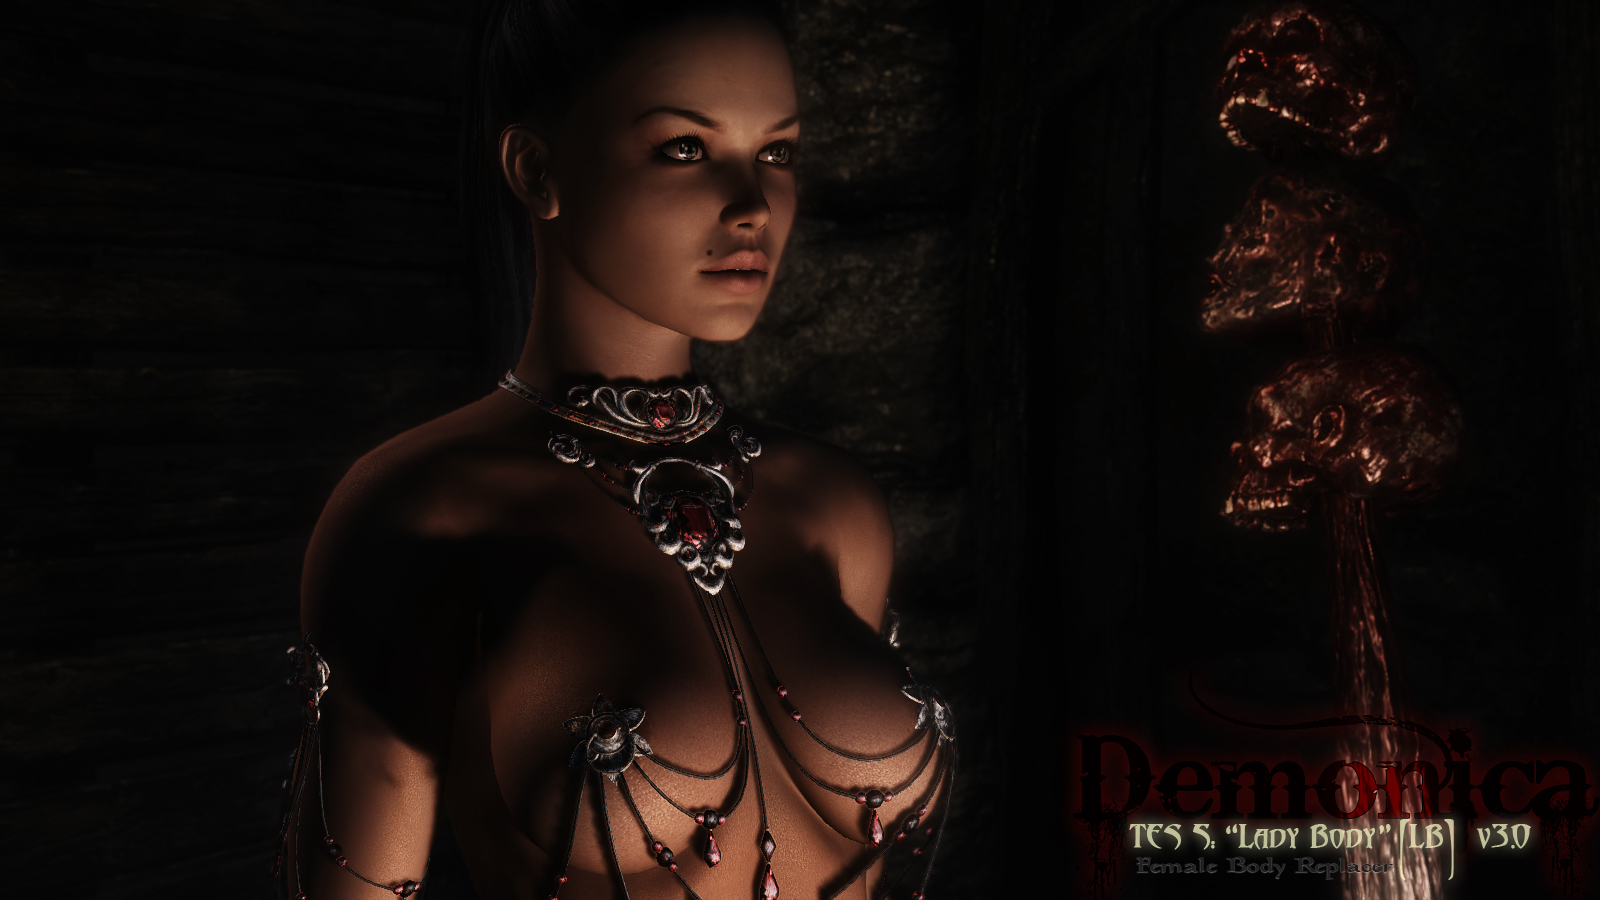 Nude vampire woman wallpaper erotic photo